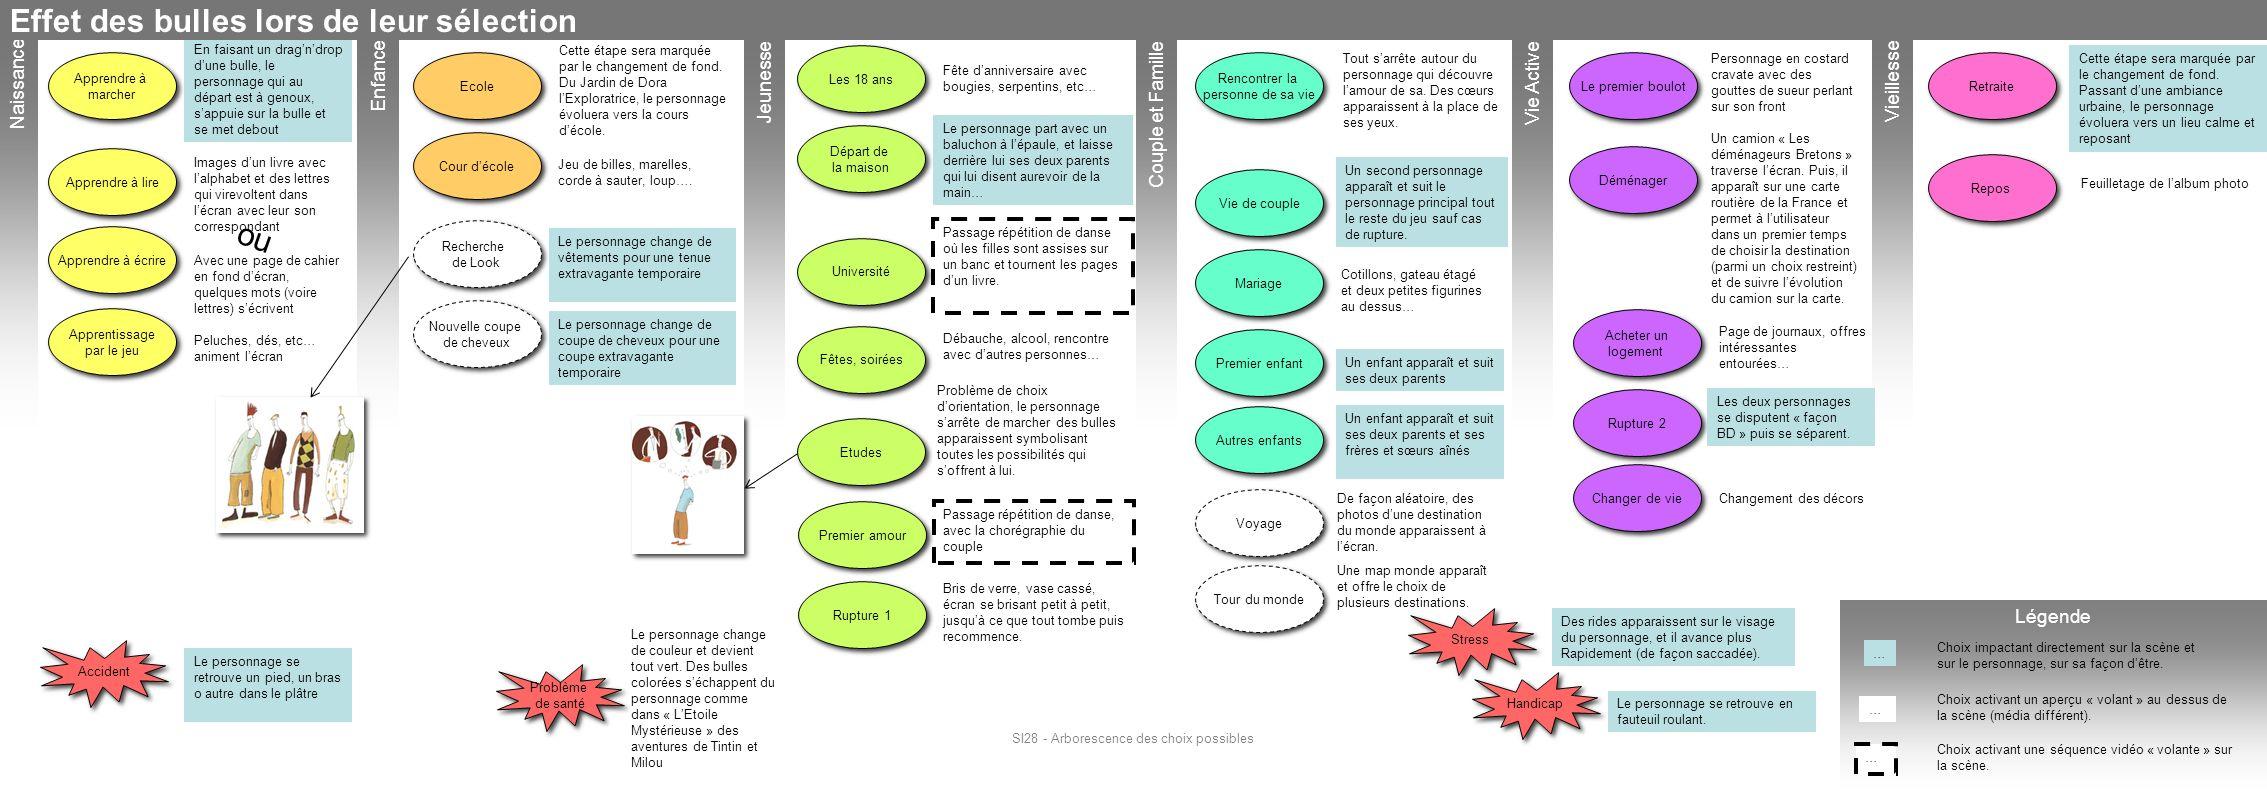 SI28 - Arborescence des choix possibles